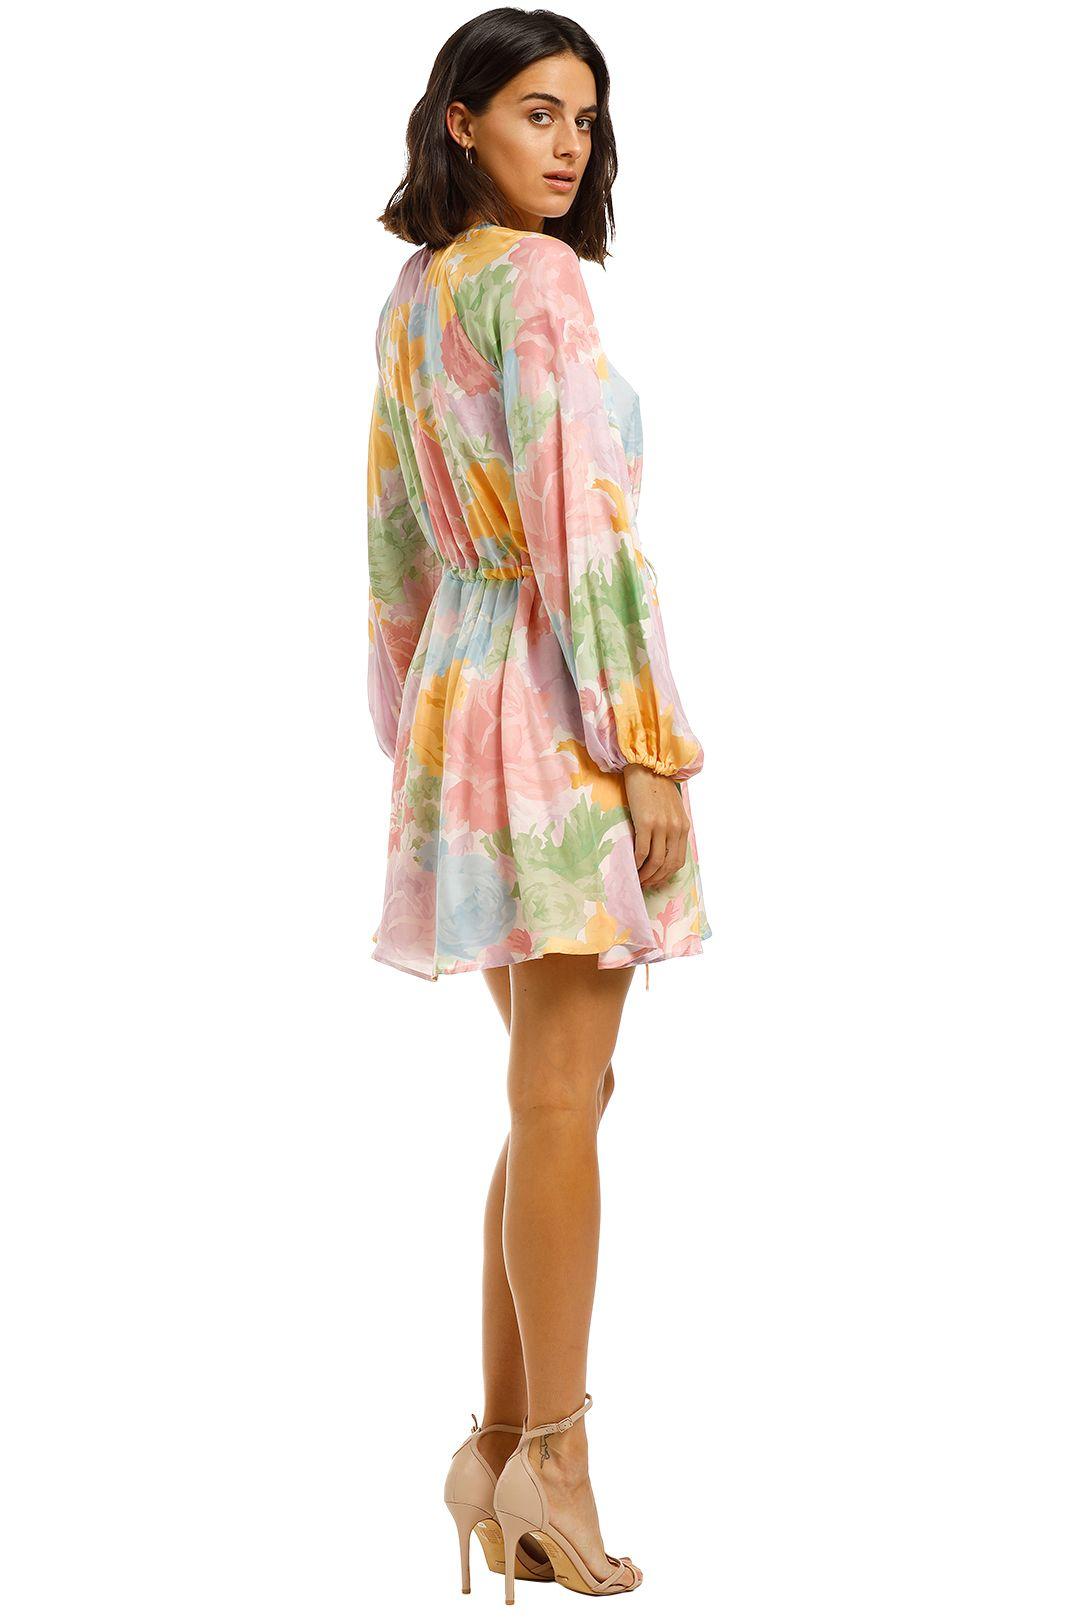 Stine-Goya-Coco-Dress-Rose-Garden-Pastel-Back